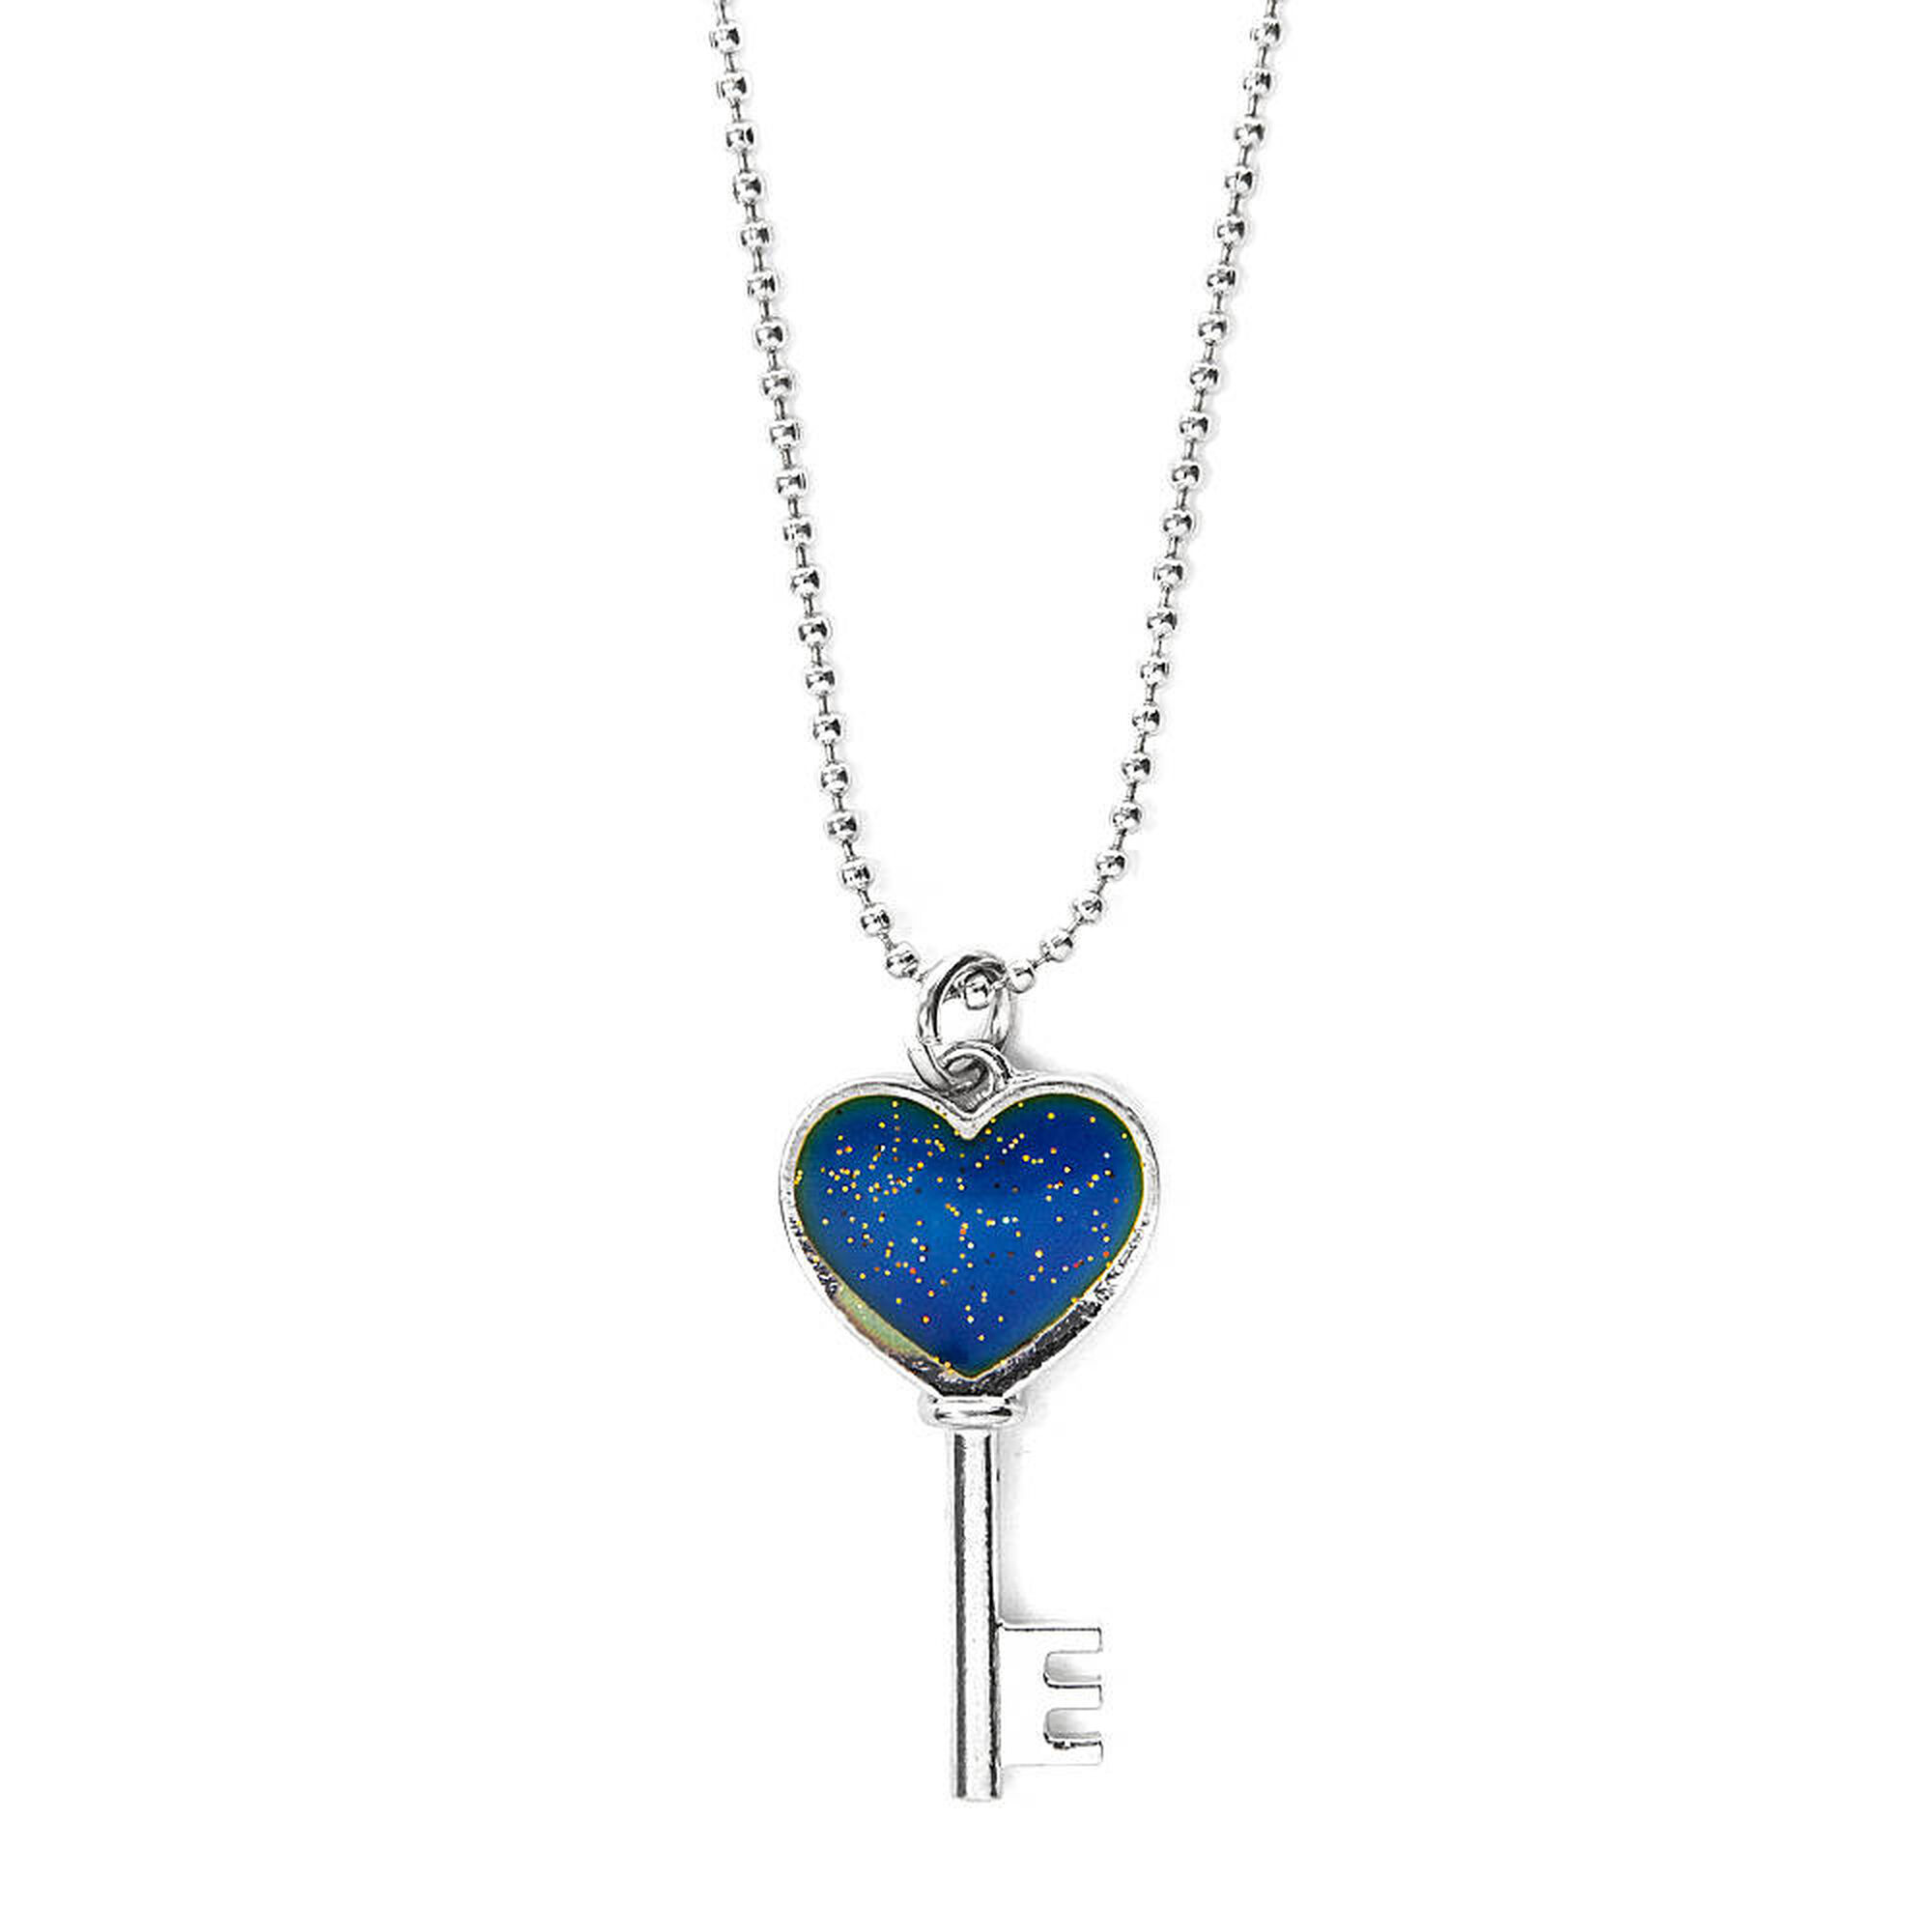 Mood heart key pendant necklace claires us mood heart key pendant necklace mozeypictures Image collections